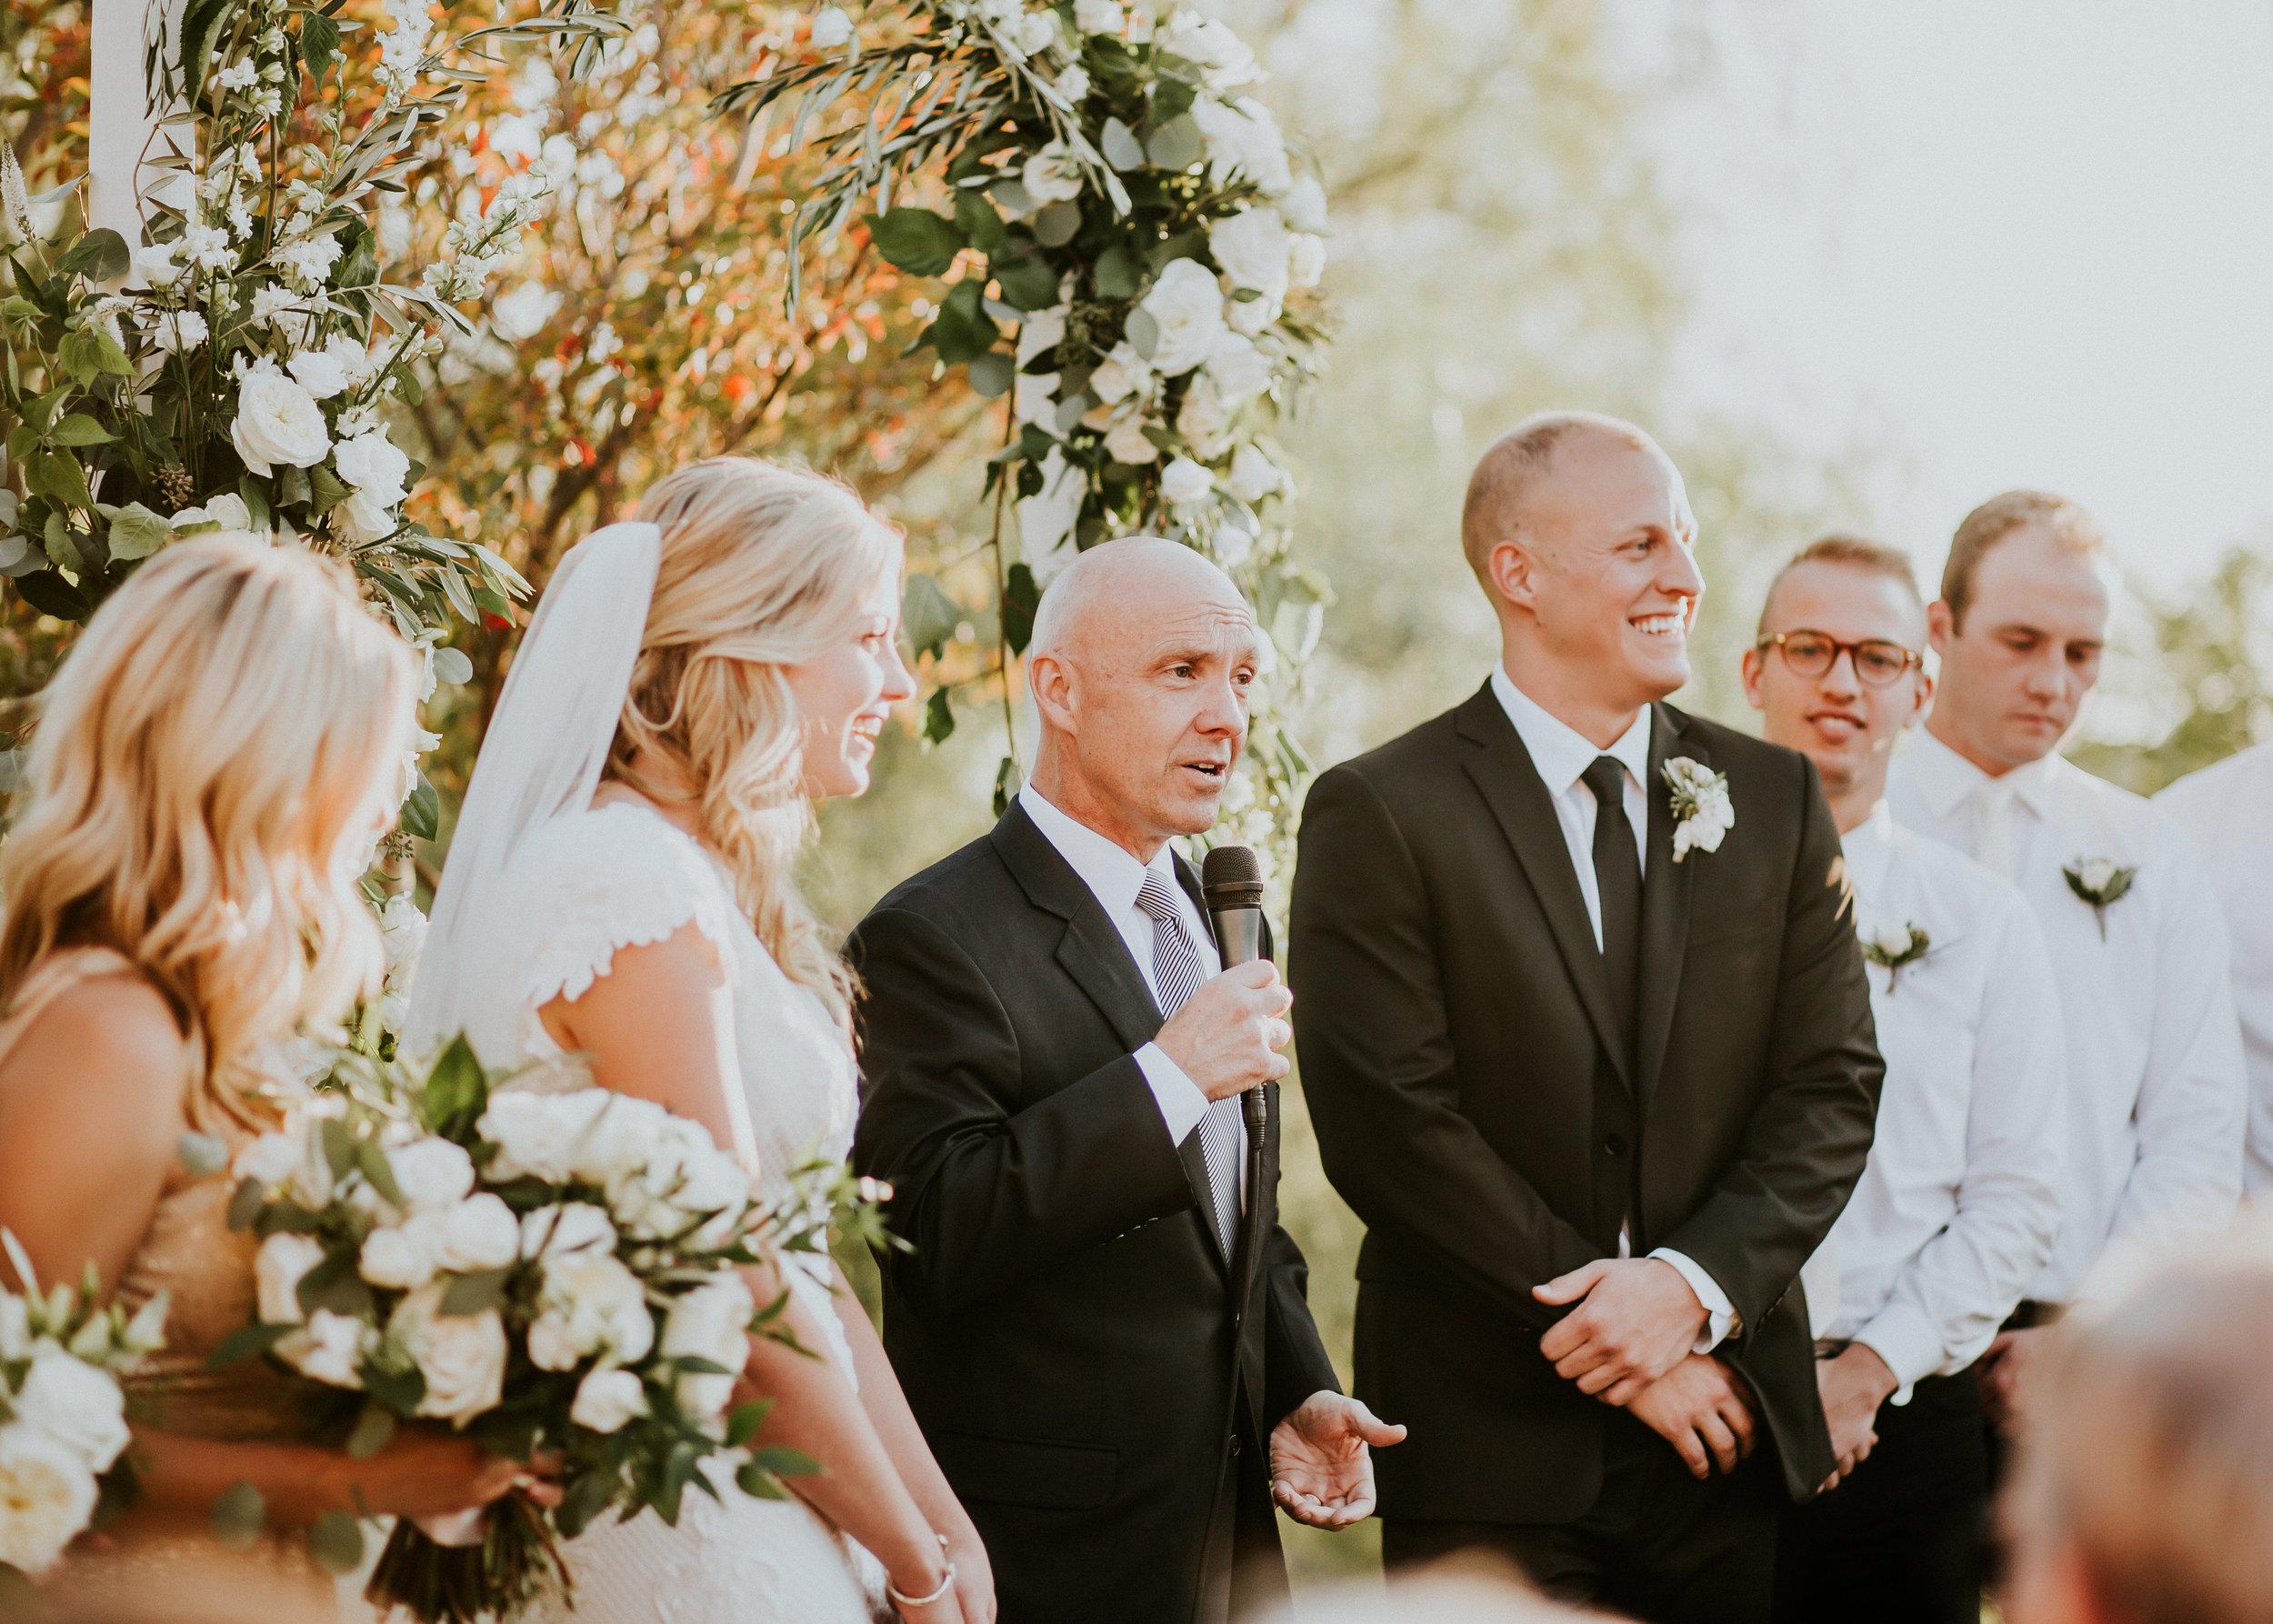 WeddingDay-356.jpg